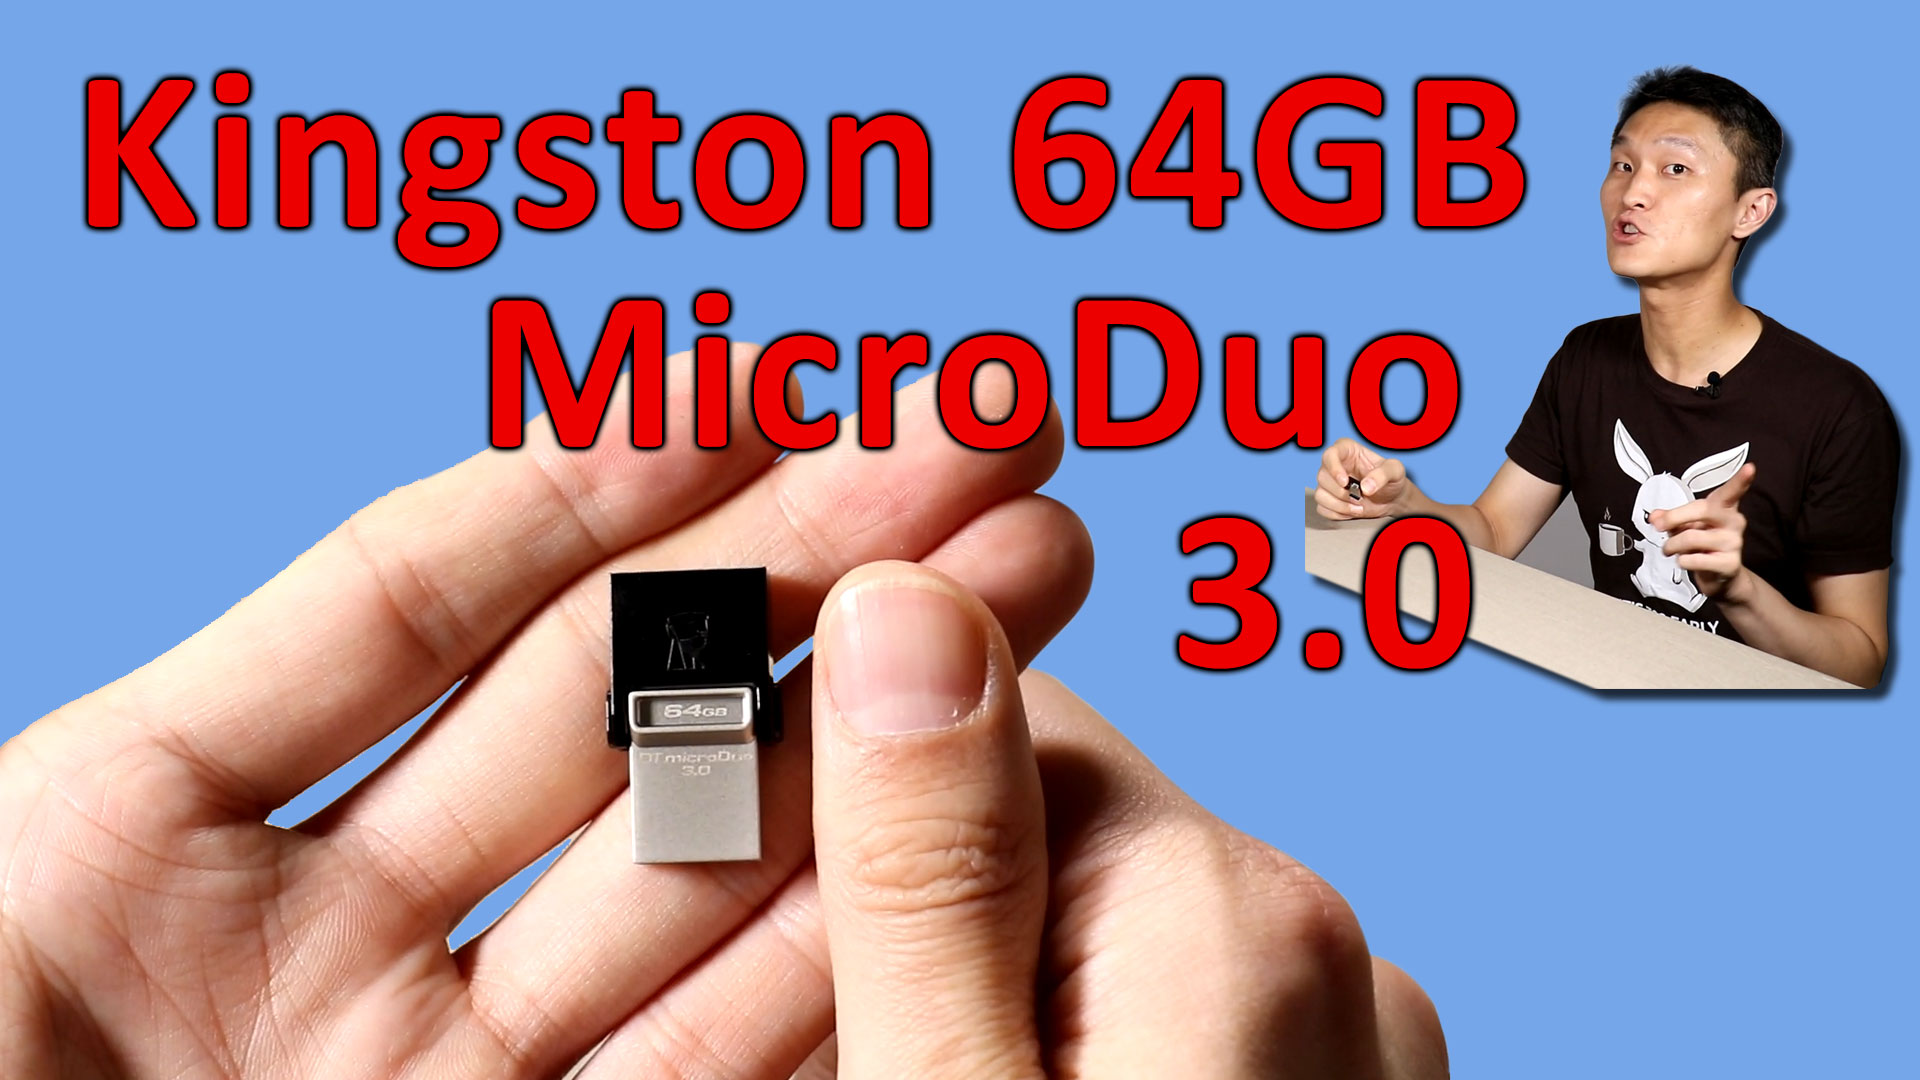 Kingston microDuo 3.0